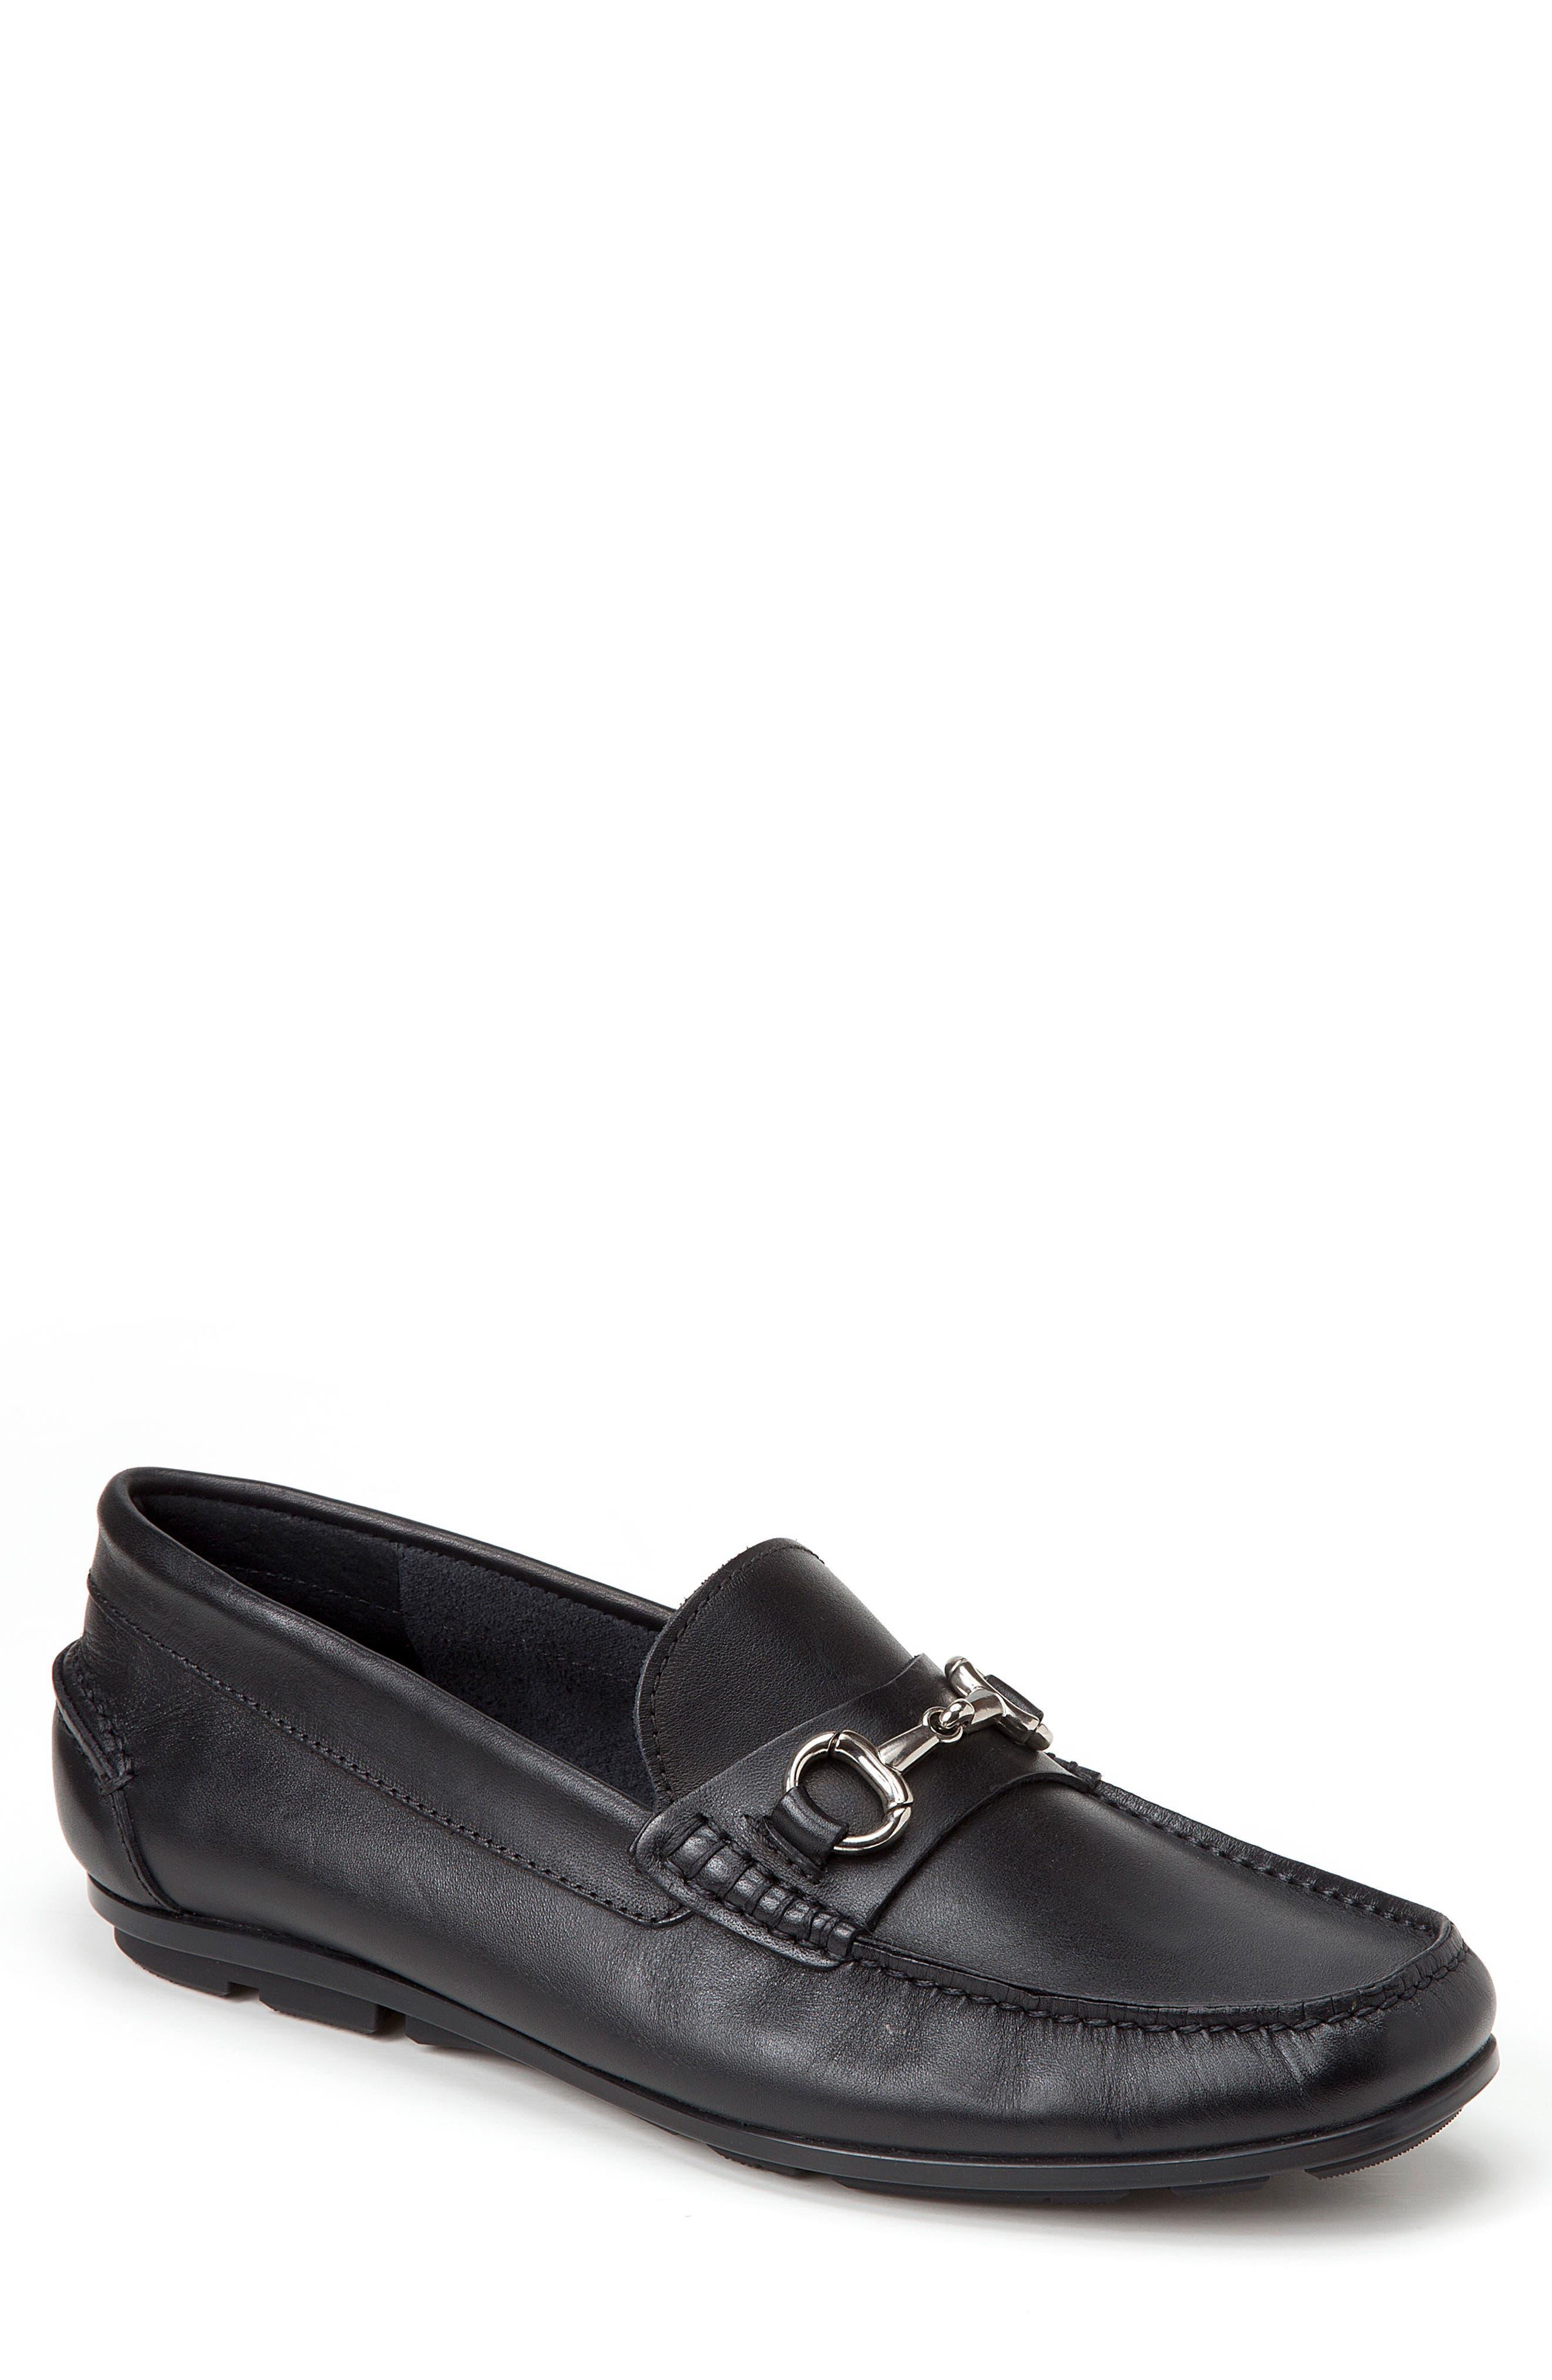 Marco Moc Toe Loafer,                         Main,                         color, Black Leather